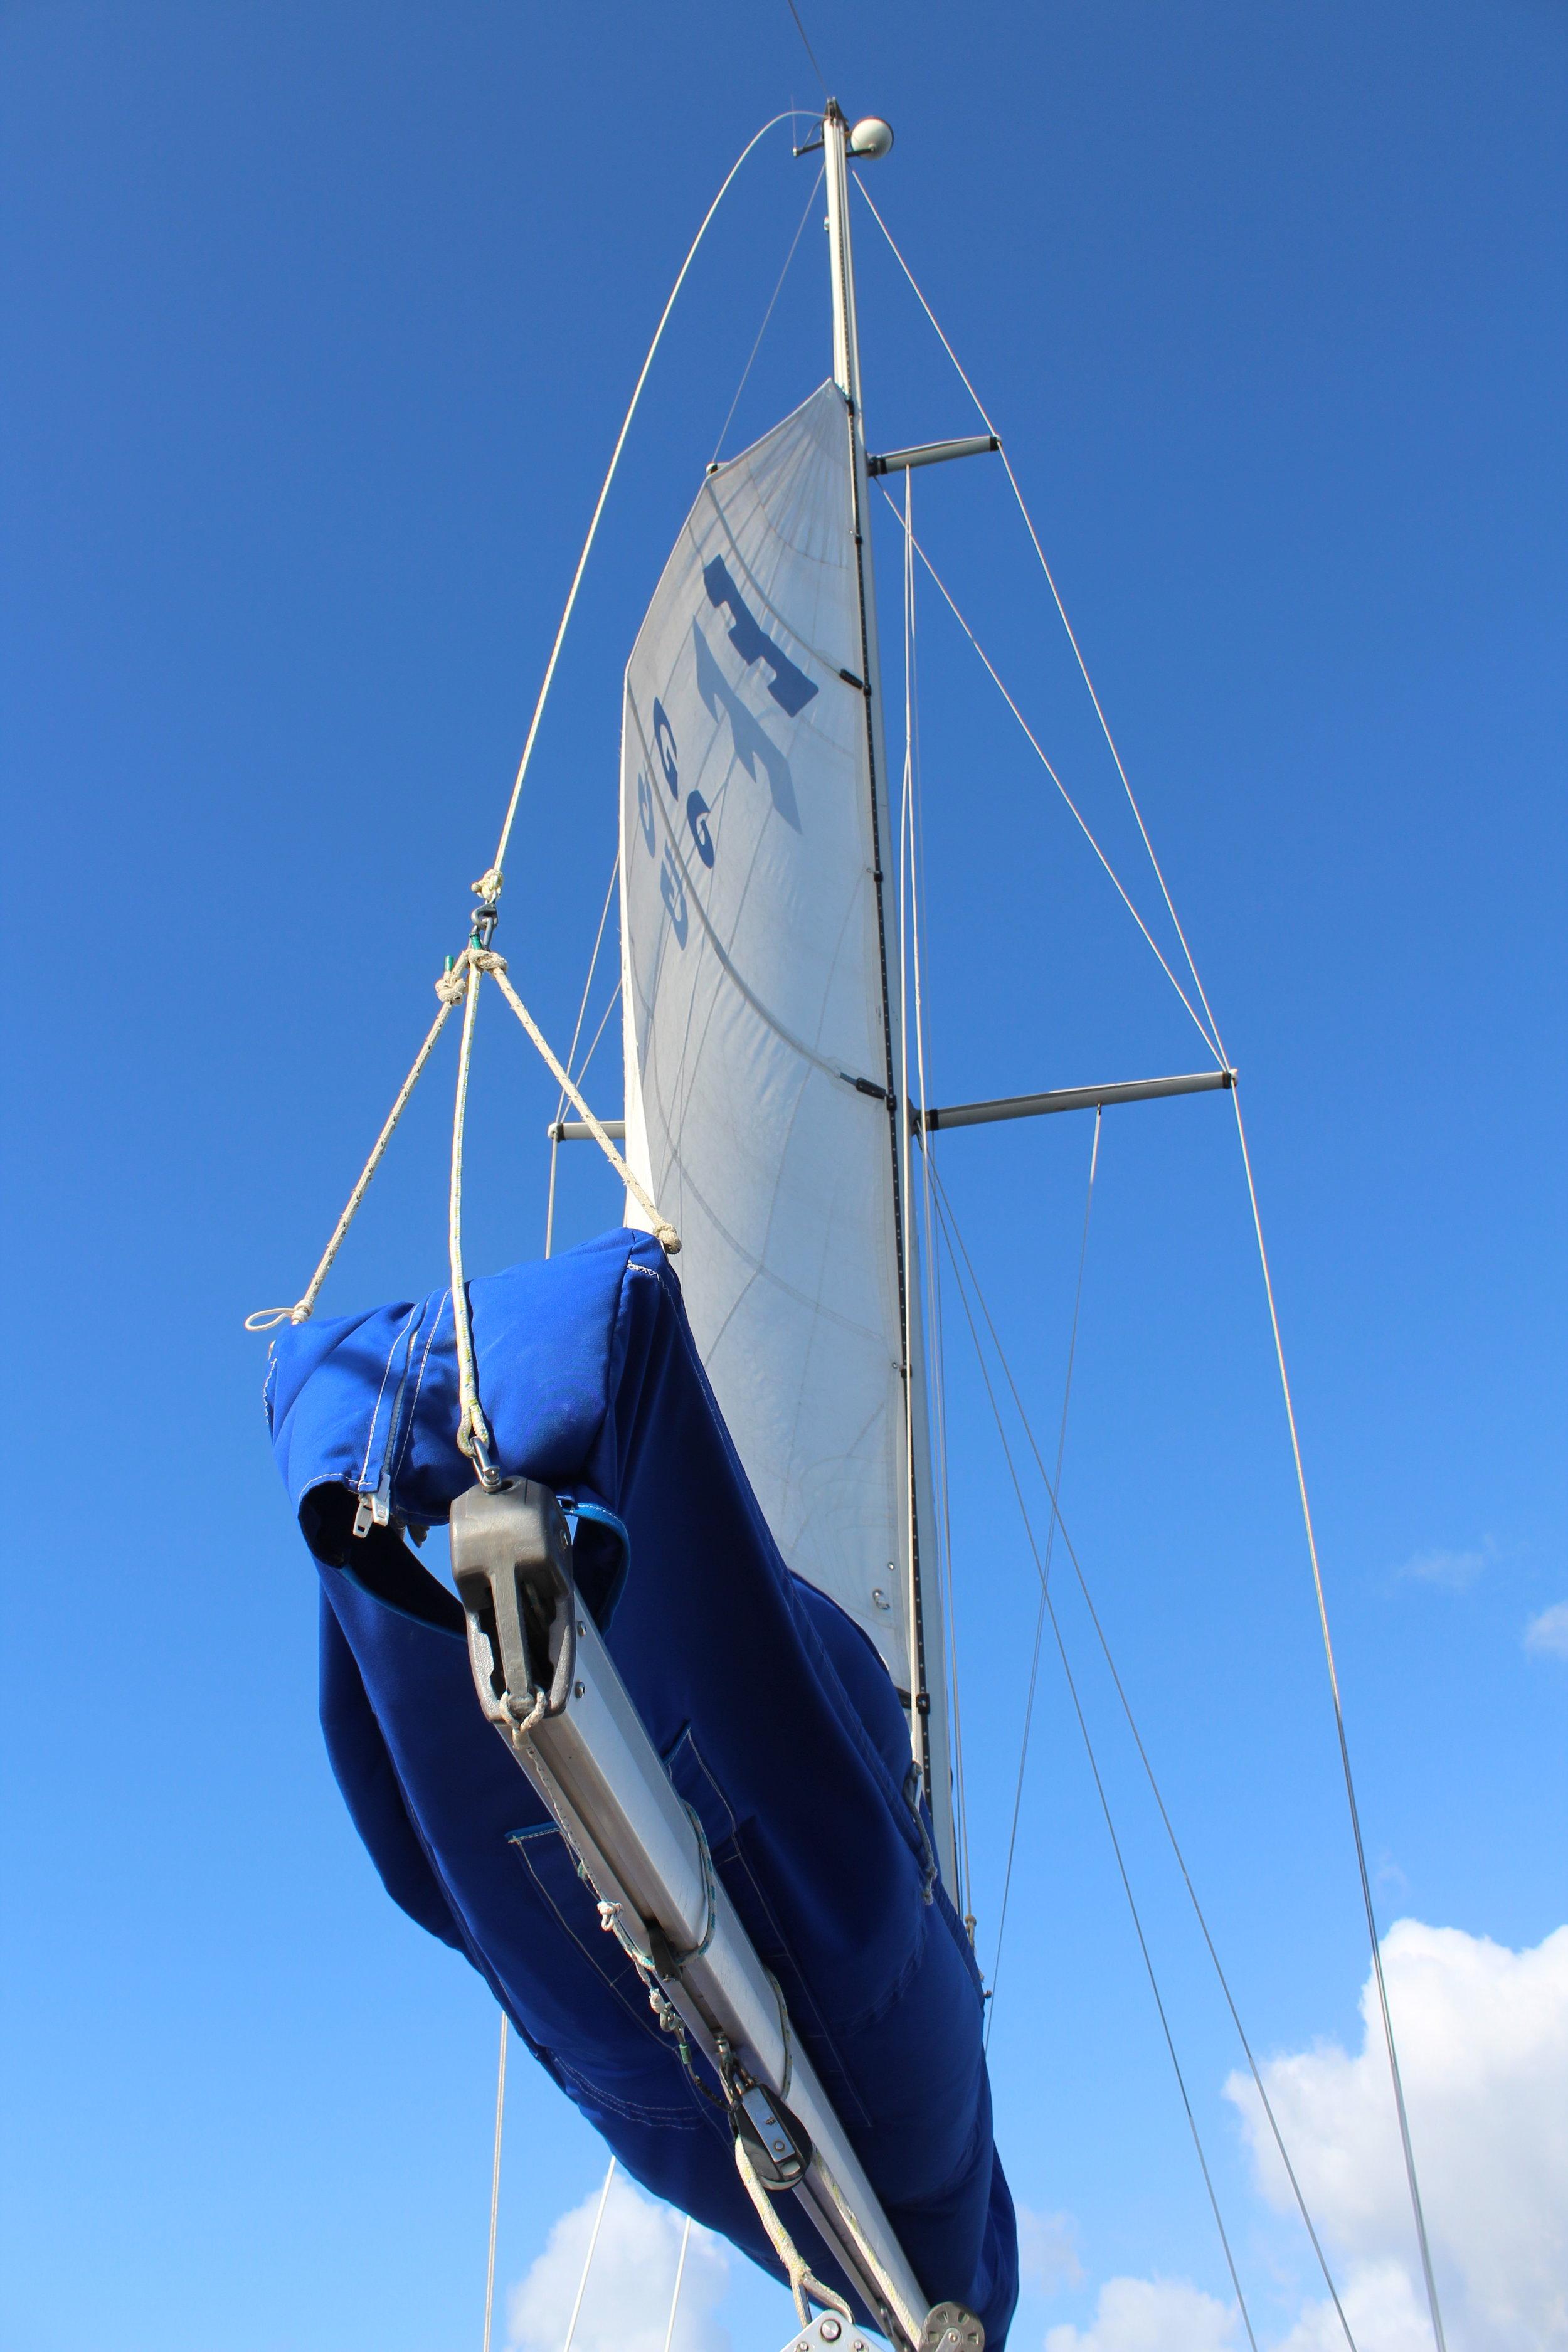 Main sail reefed